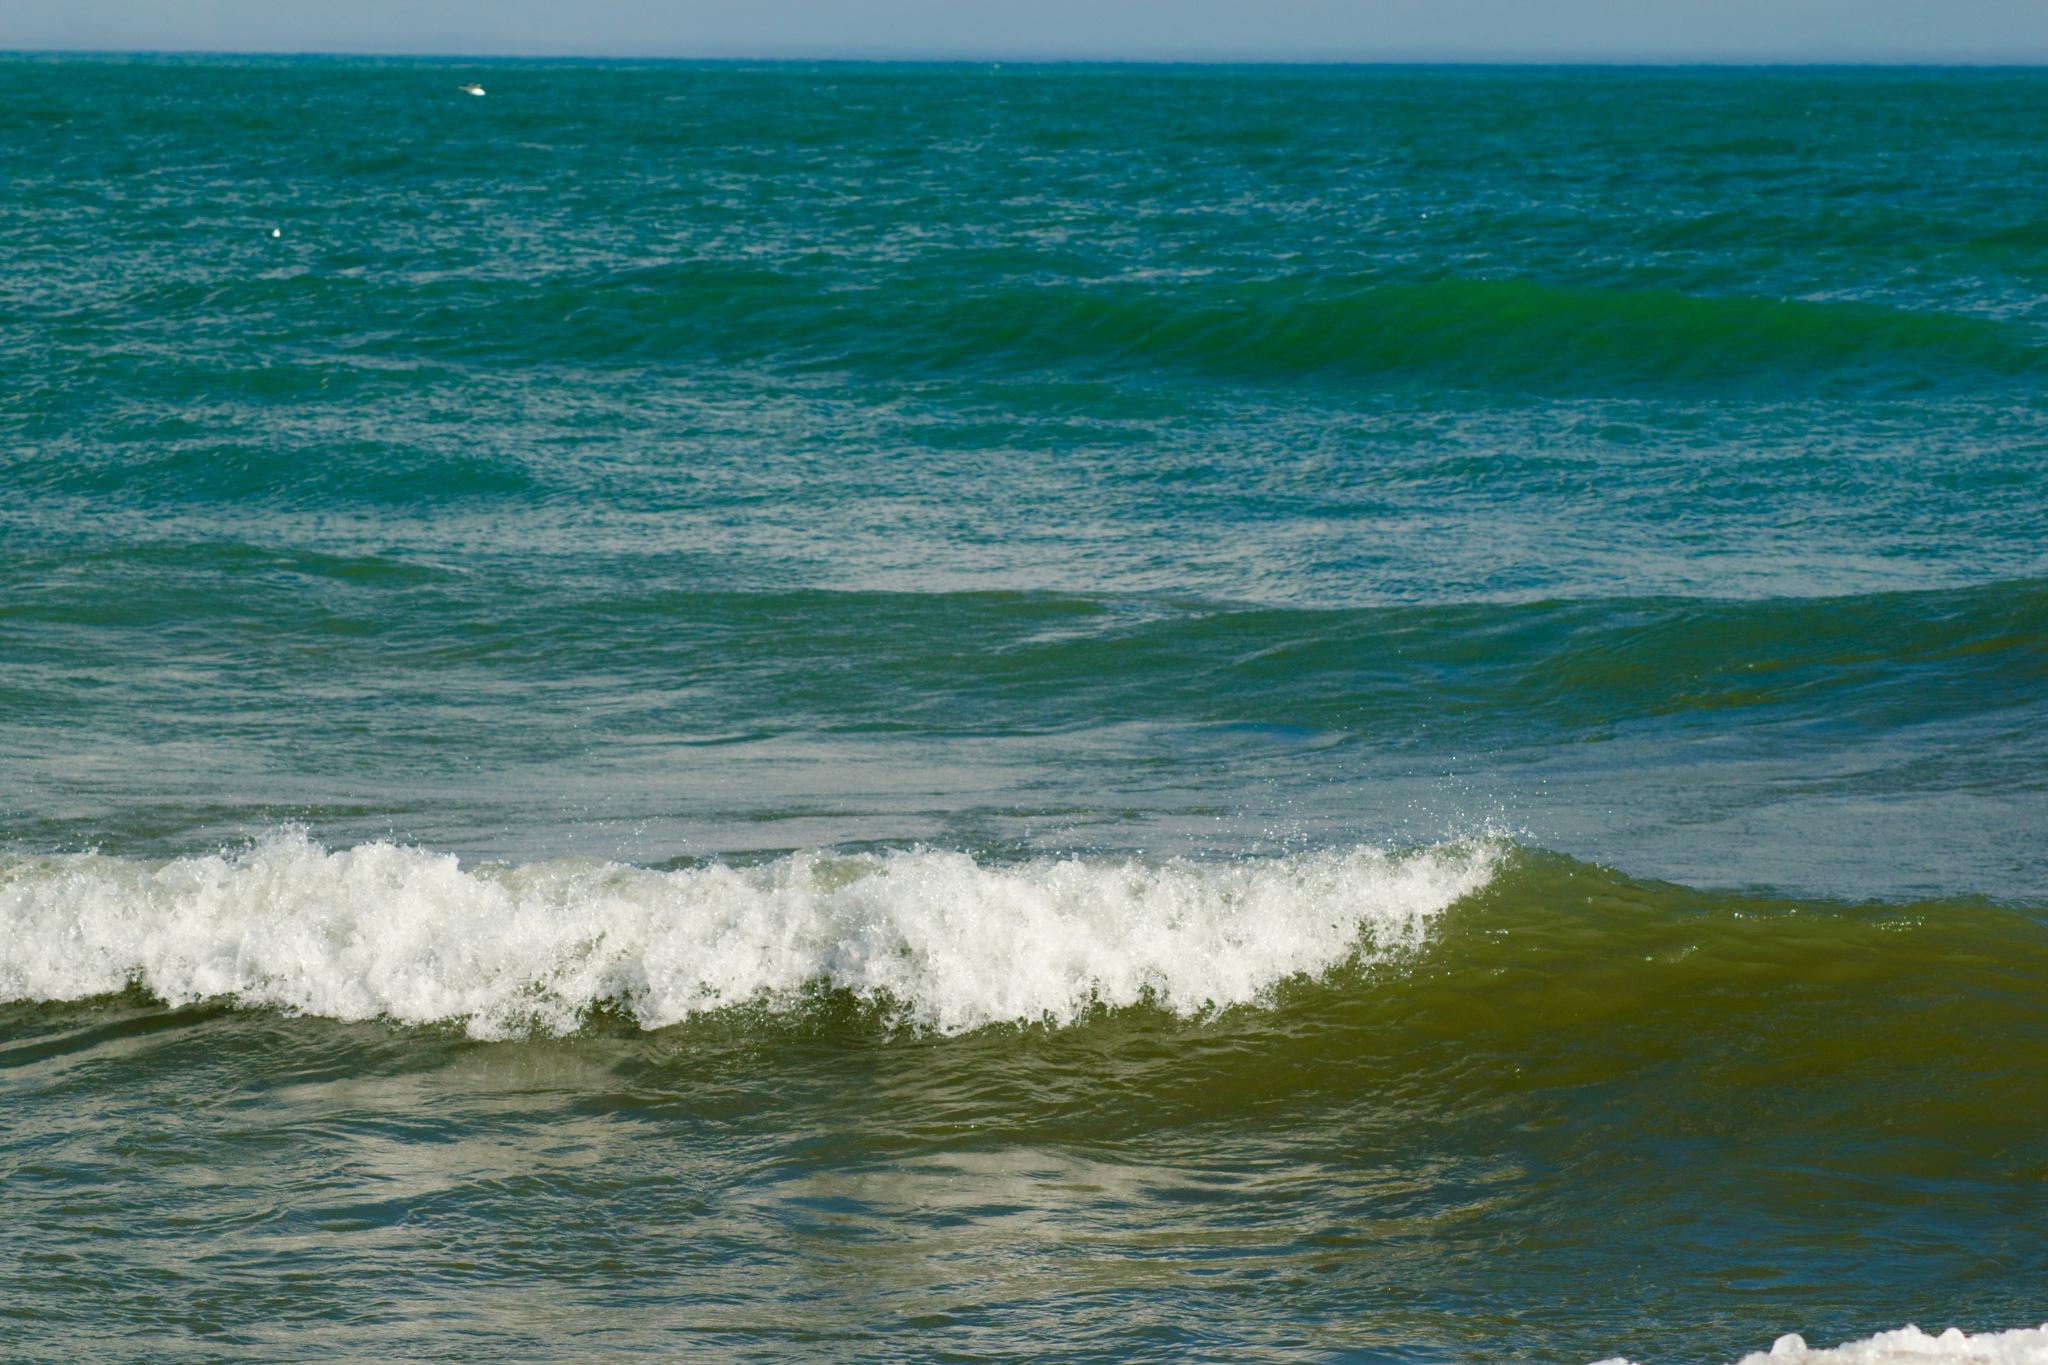 Waves. by eightonesixxx